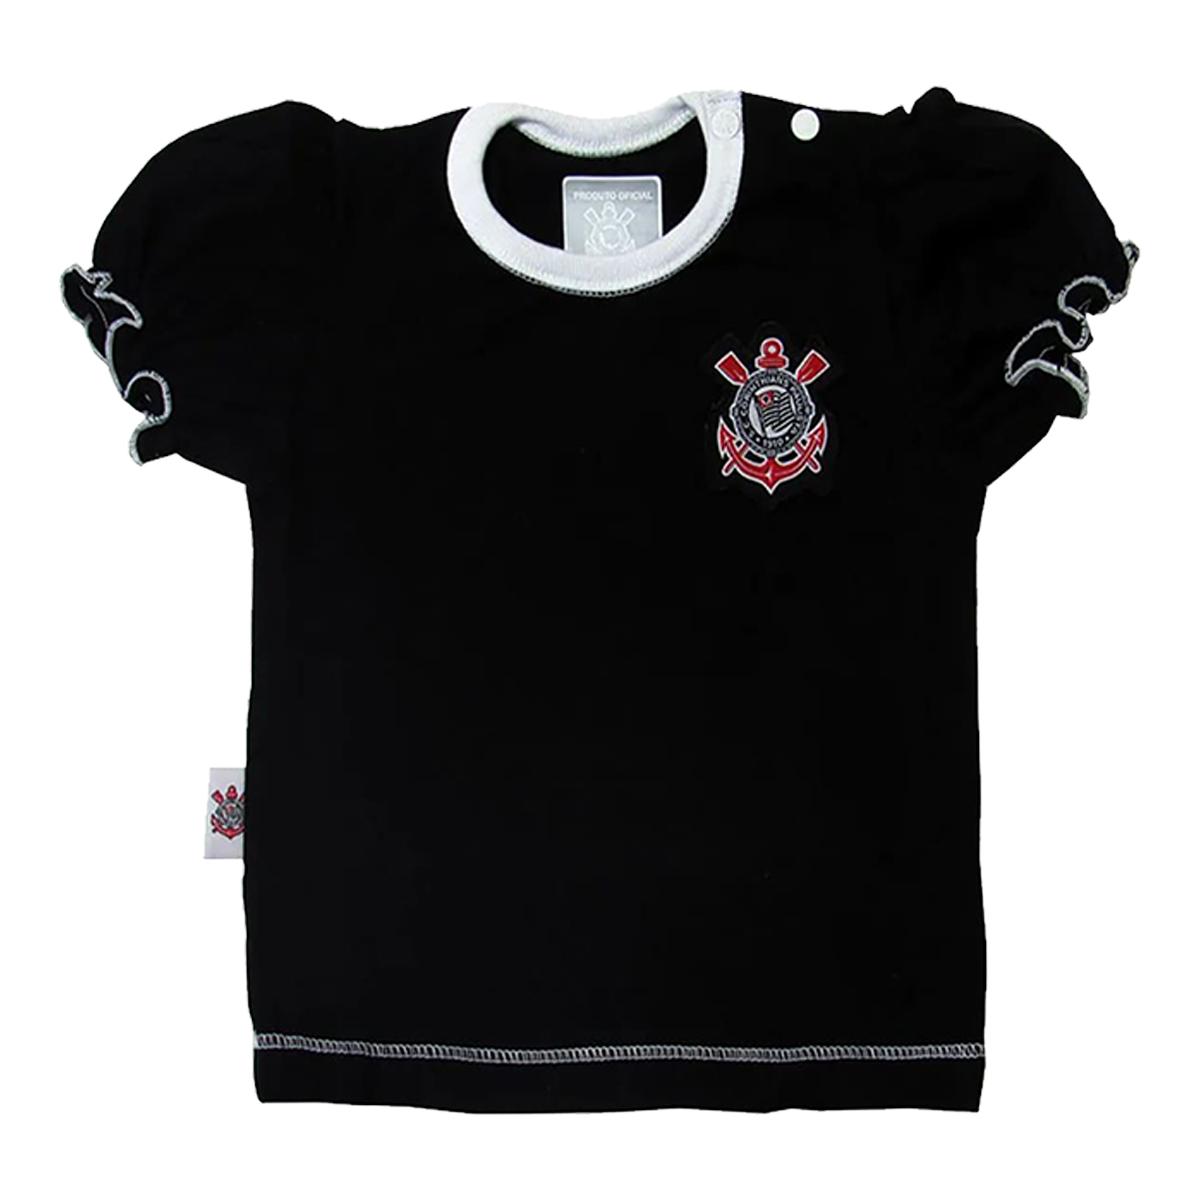 Camiseta Baby Look Bebê Menina Corinthians Oficial